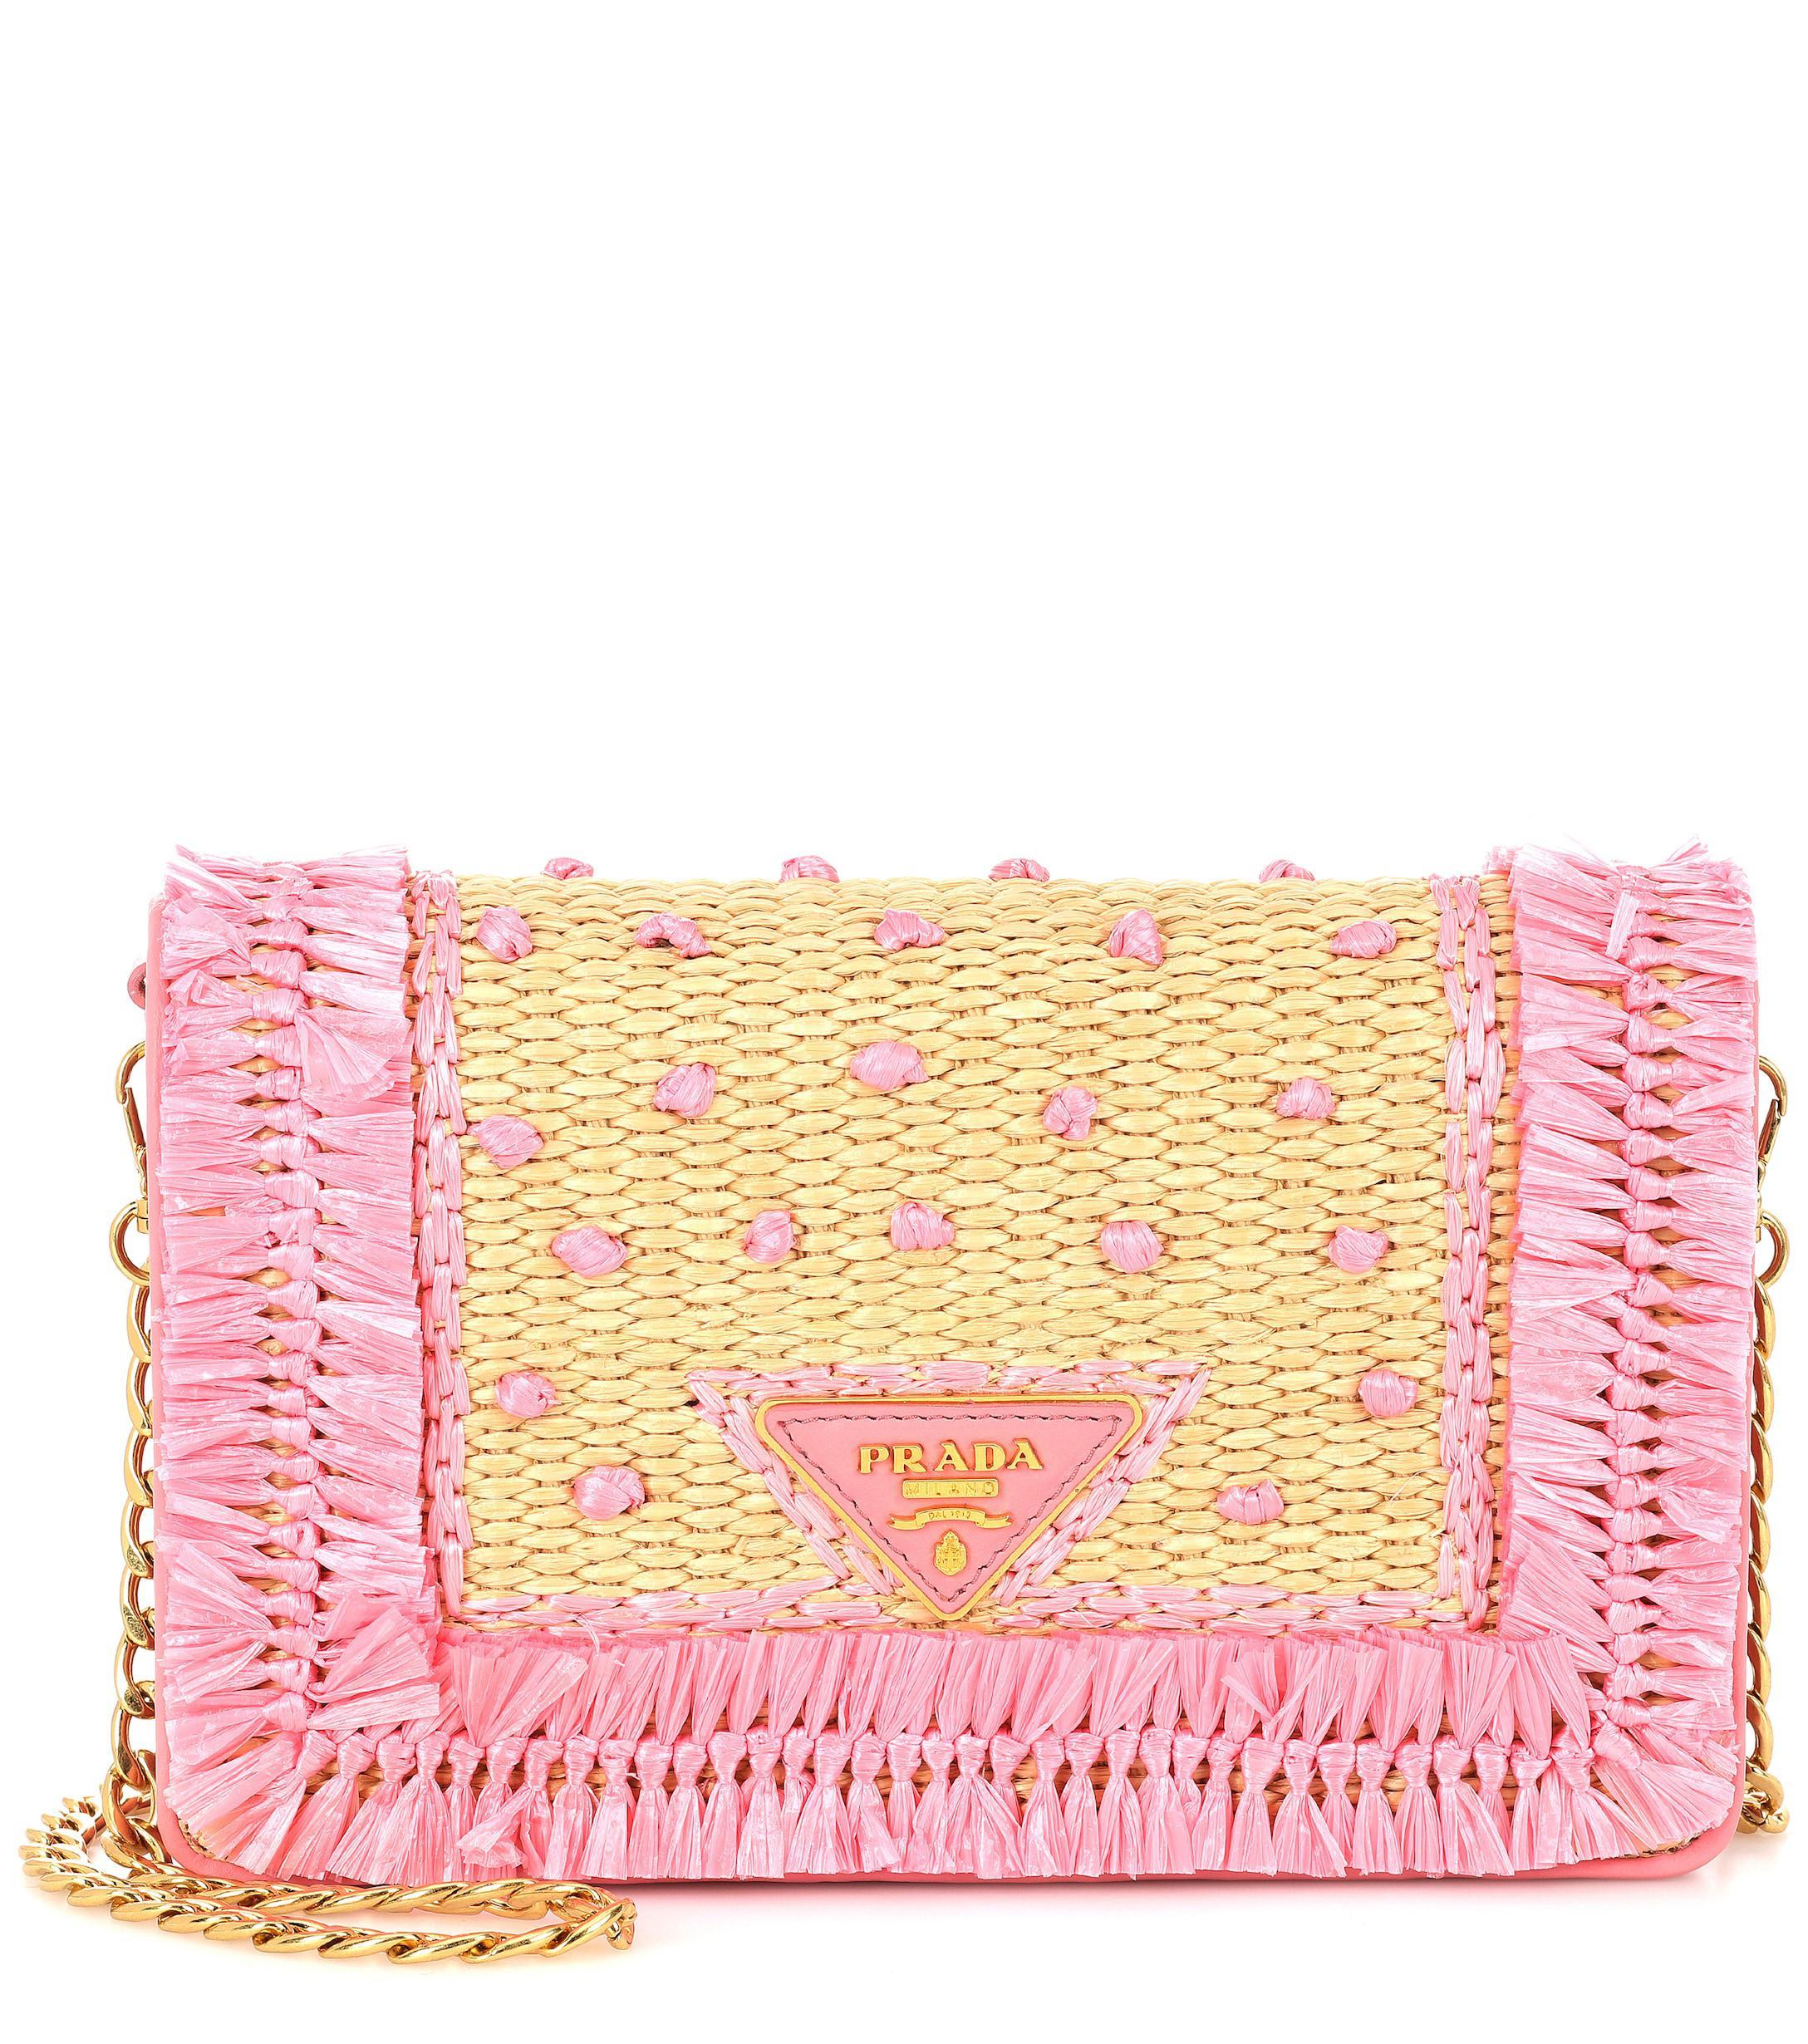 Prada - Pink Leather And Raffia Shoulder Bag - Lyst. View fullscreen a54d90fe45